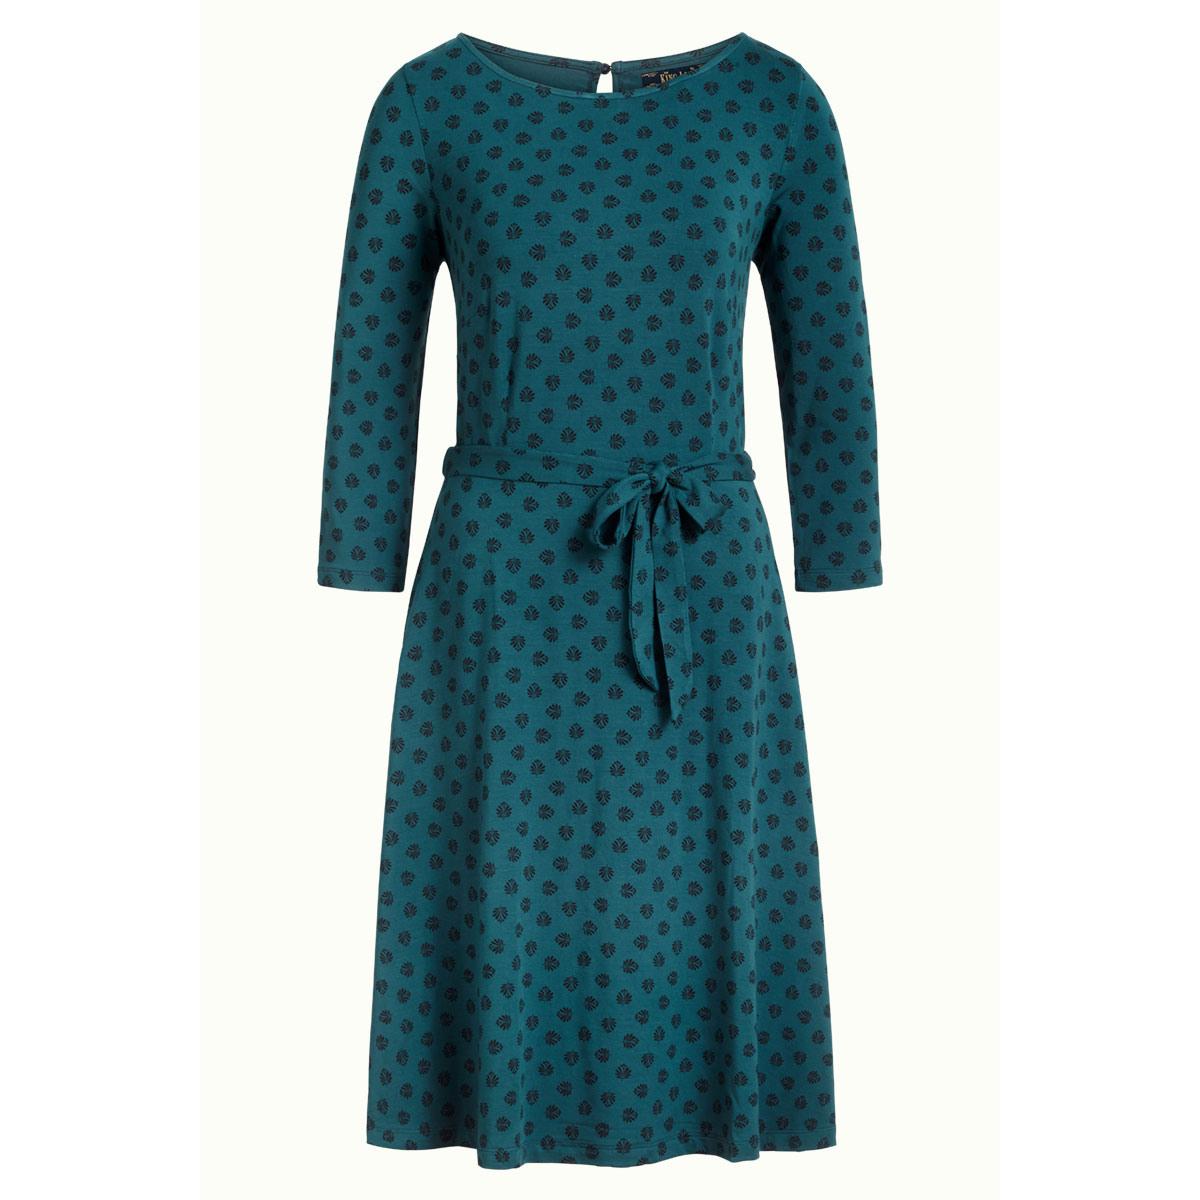 King Louie  Betty Dress York  Damen Kleid  Pond Blue